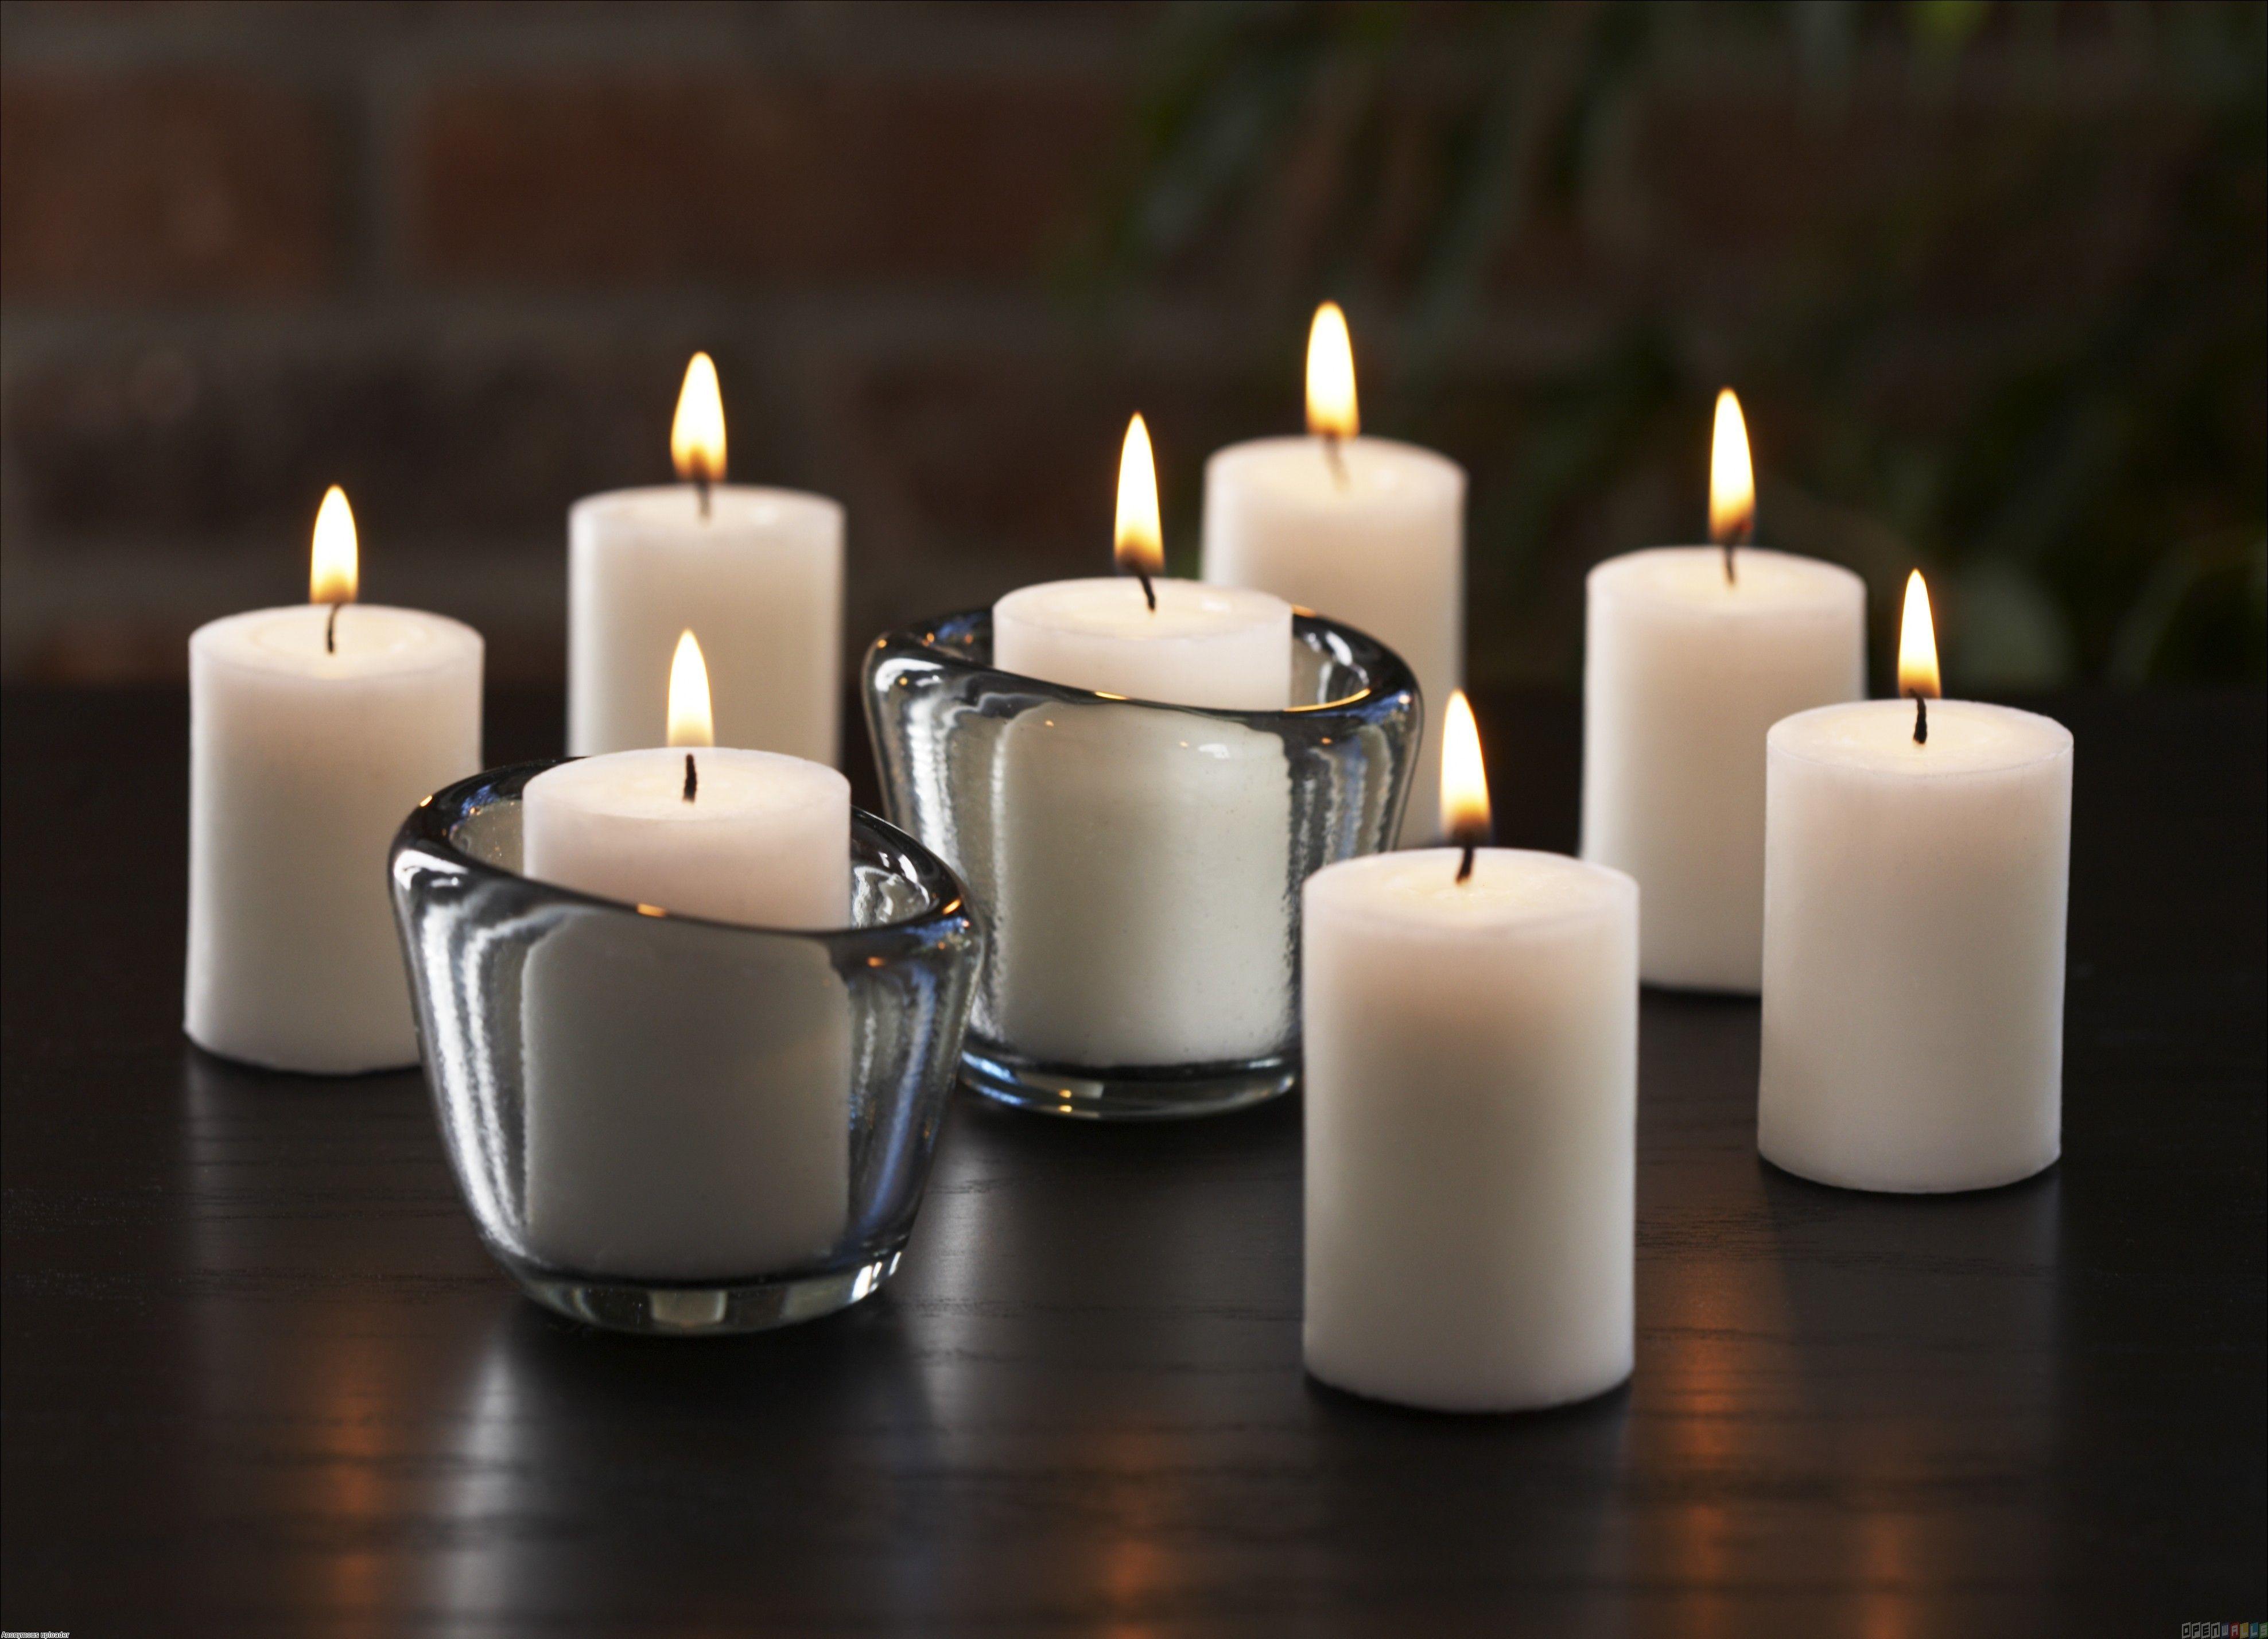 Lit white candles wallpaper Open Walls